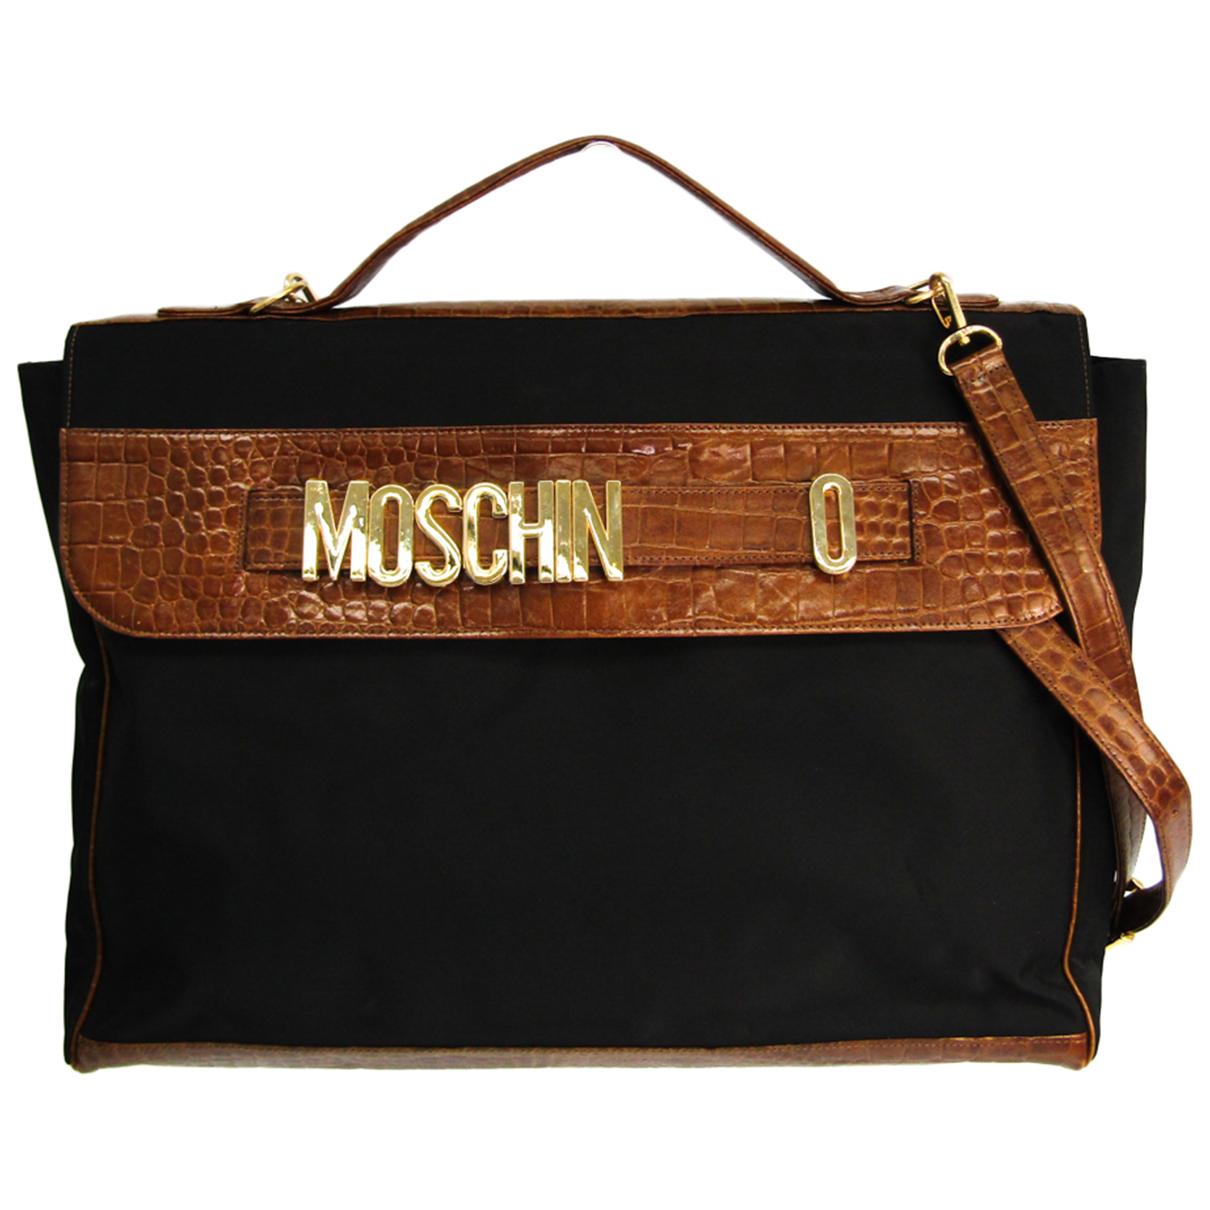 Moschino N Brown Leather handbag for Women N